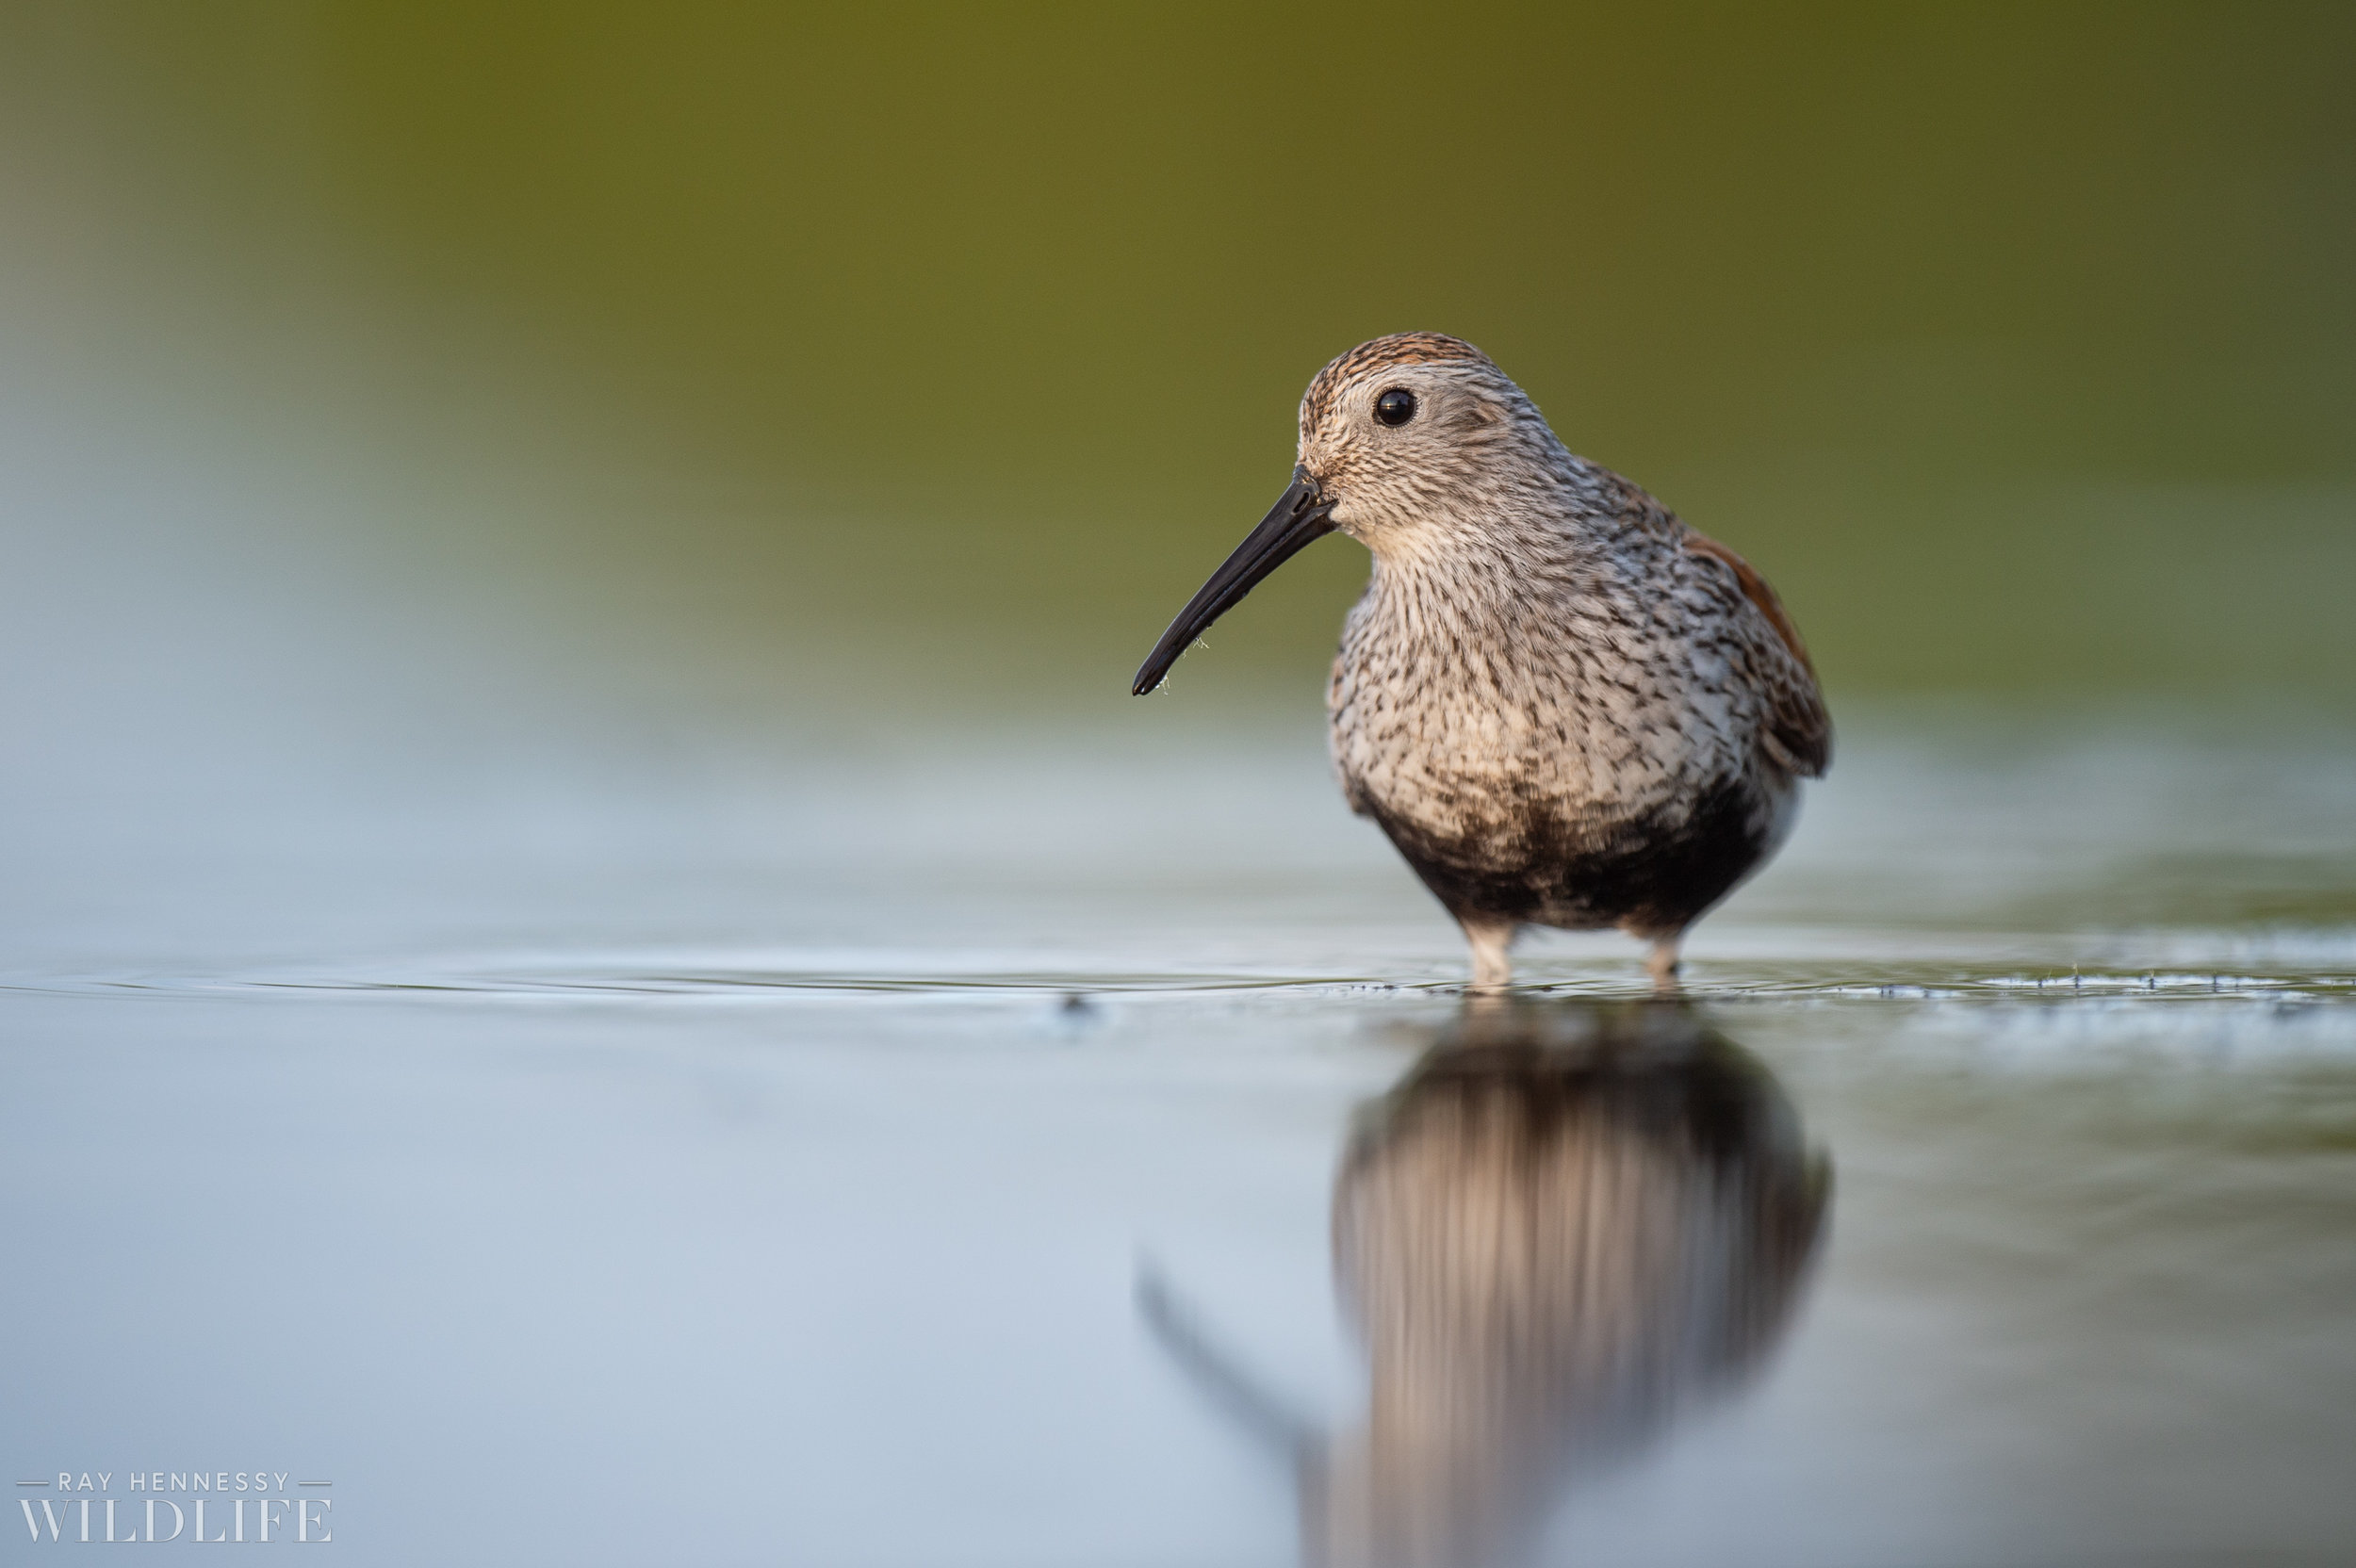 011_shorebirds-prothonotary-warbler.jpg